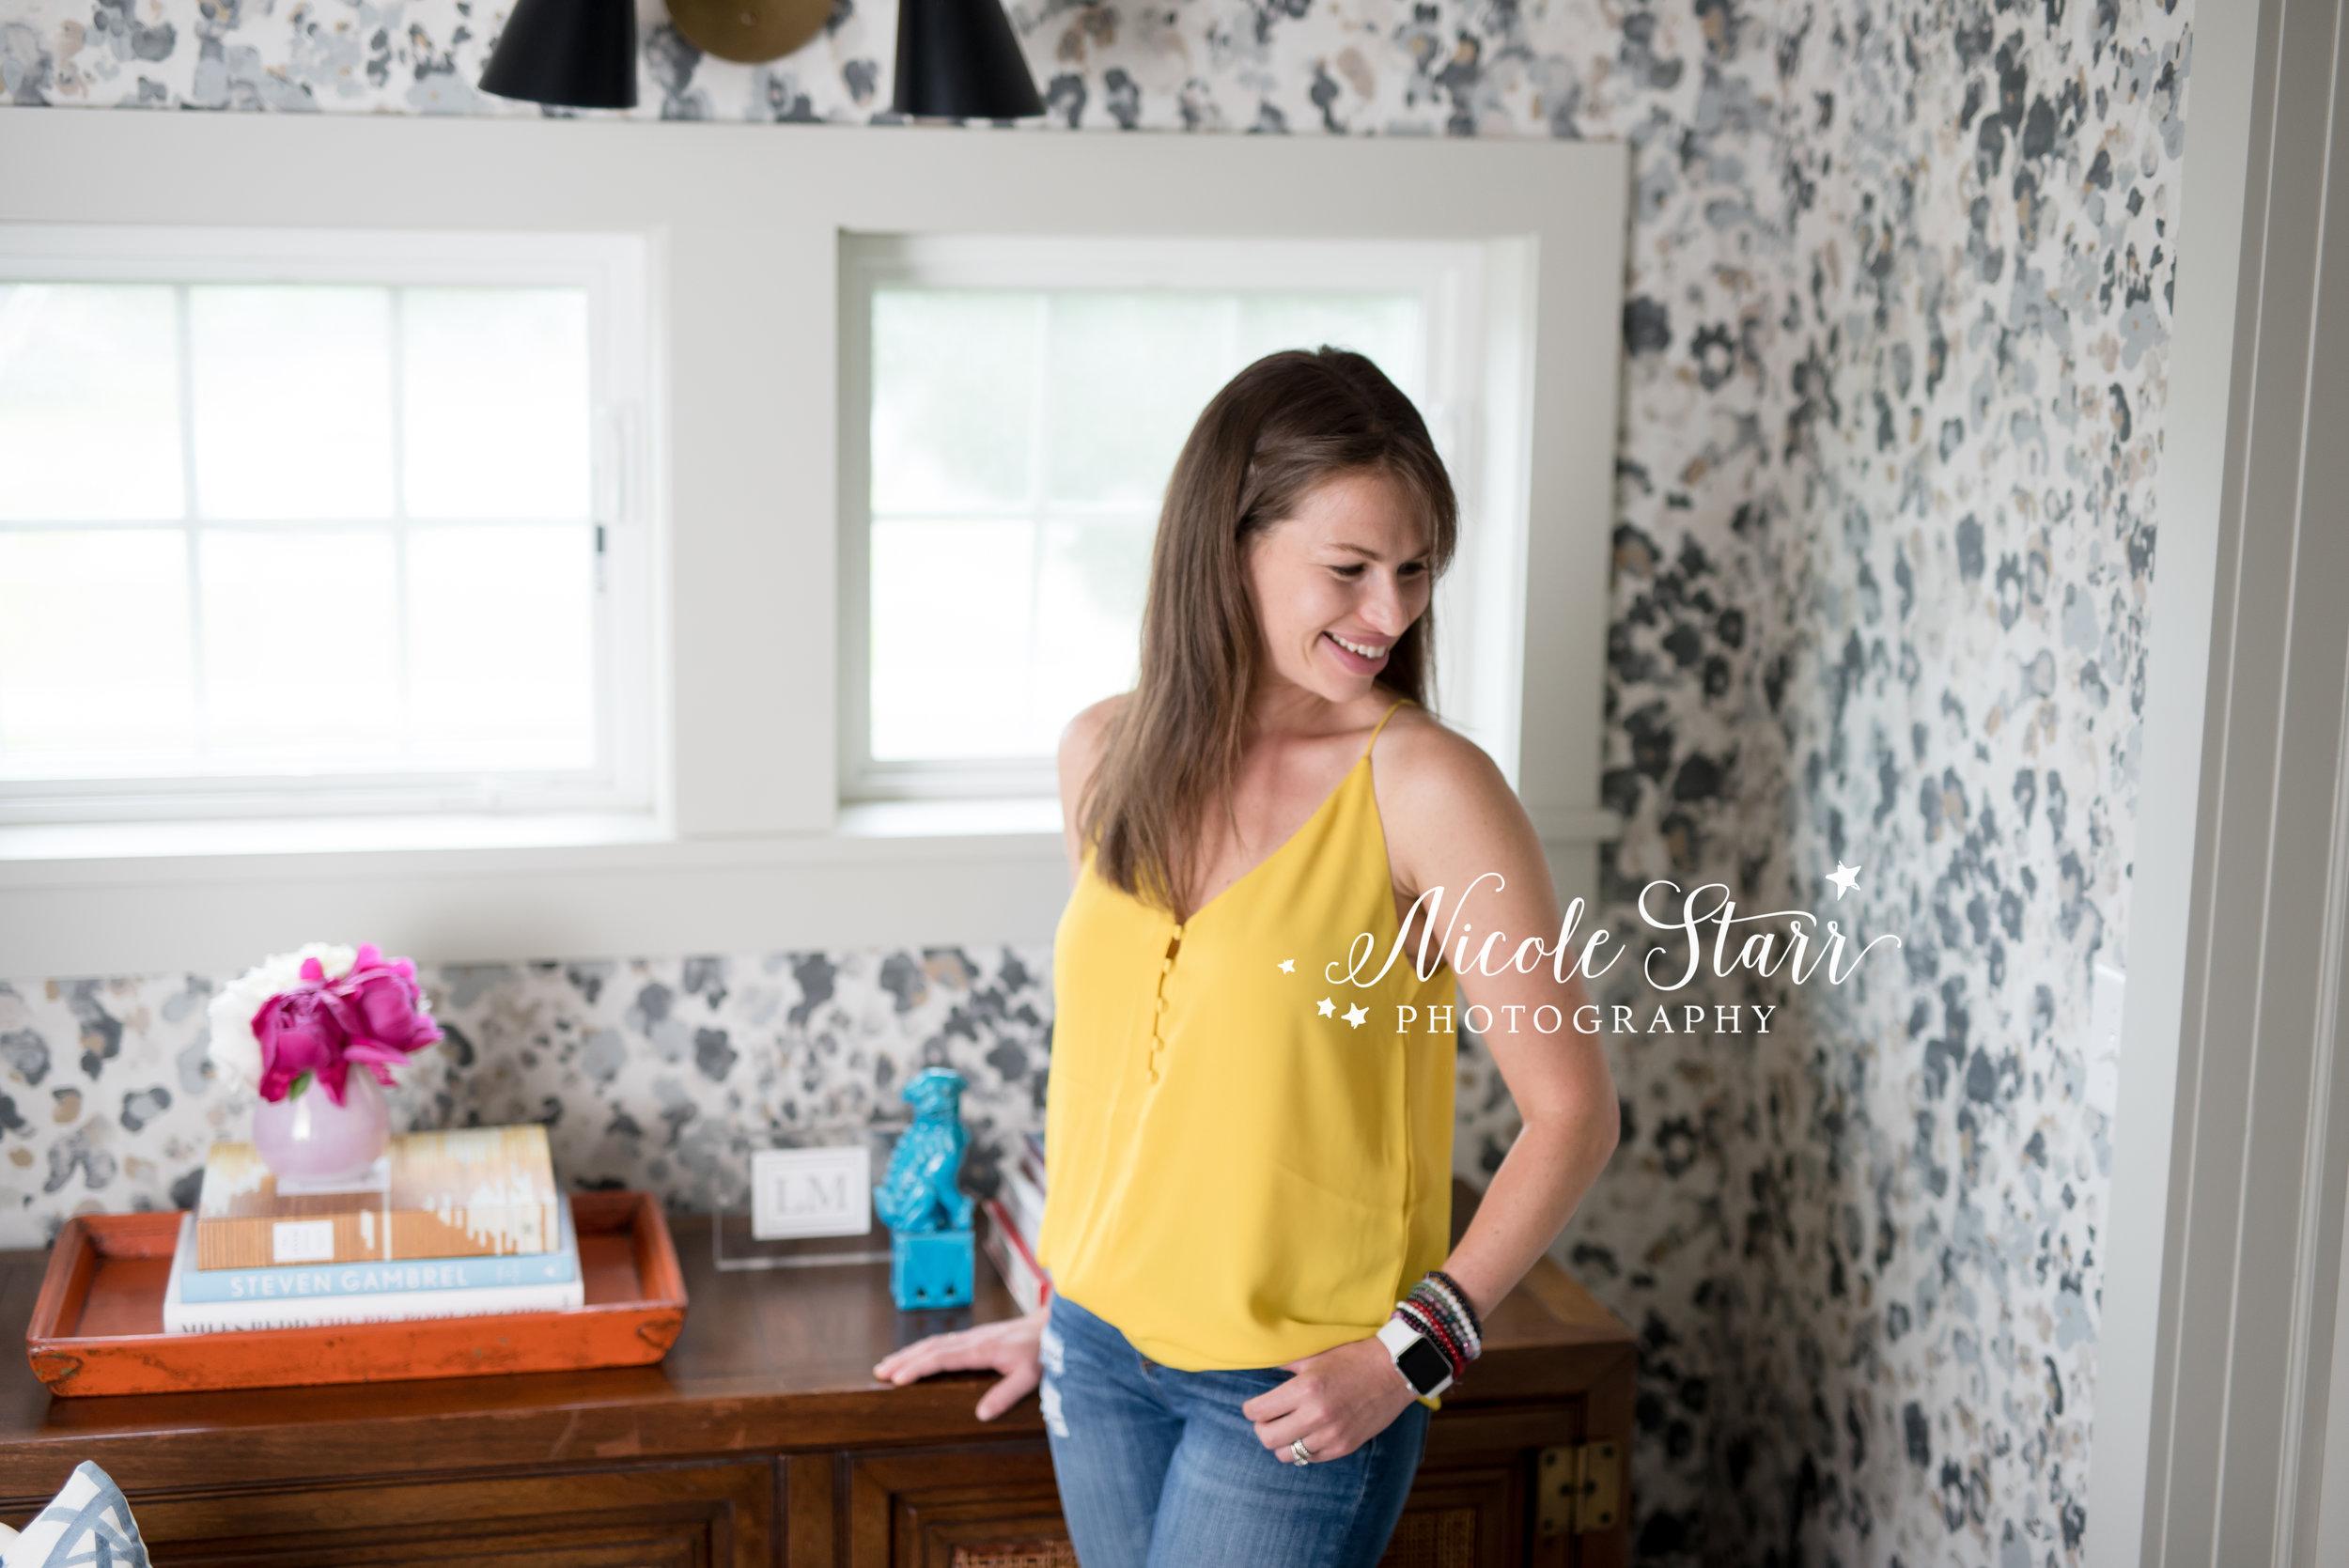 Nicole Starr Photography | Boston Headshot Photographer | Boston Lifestyle Headshot Photographer | Boston Commercial Photographer | Lifestyle Headshots | Interior Designer, Interior Design branding session, branding session, branding photographer, branding photography, branding, small business owner